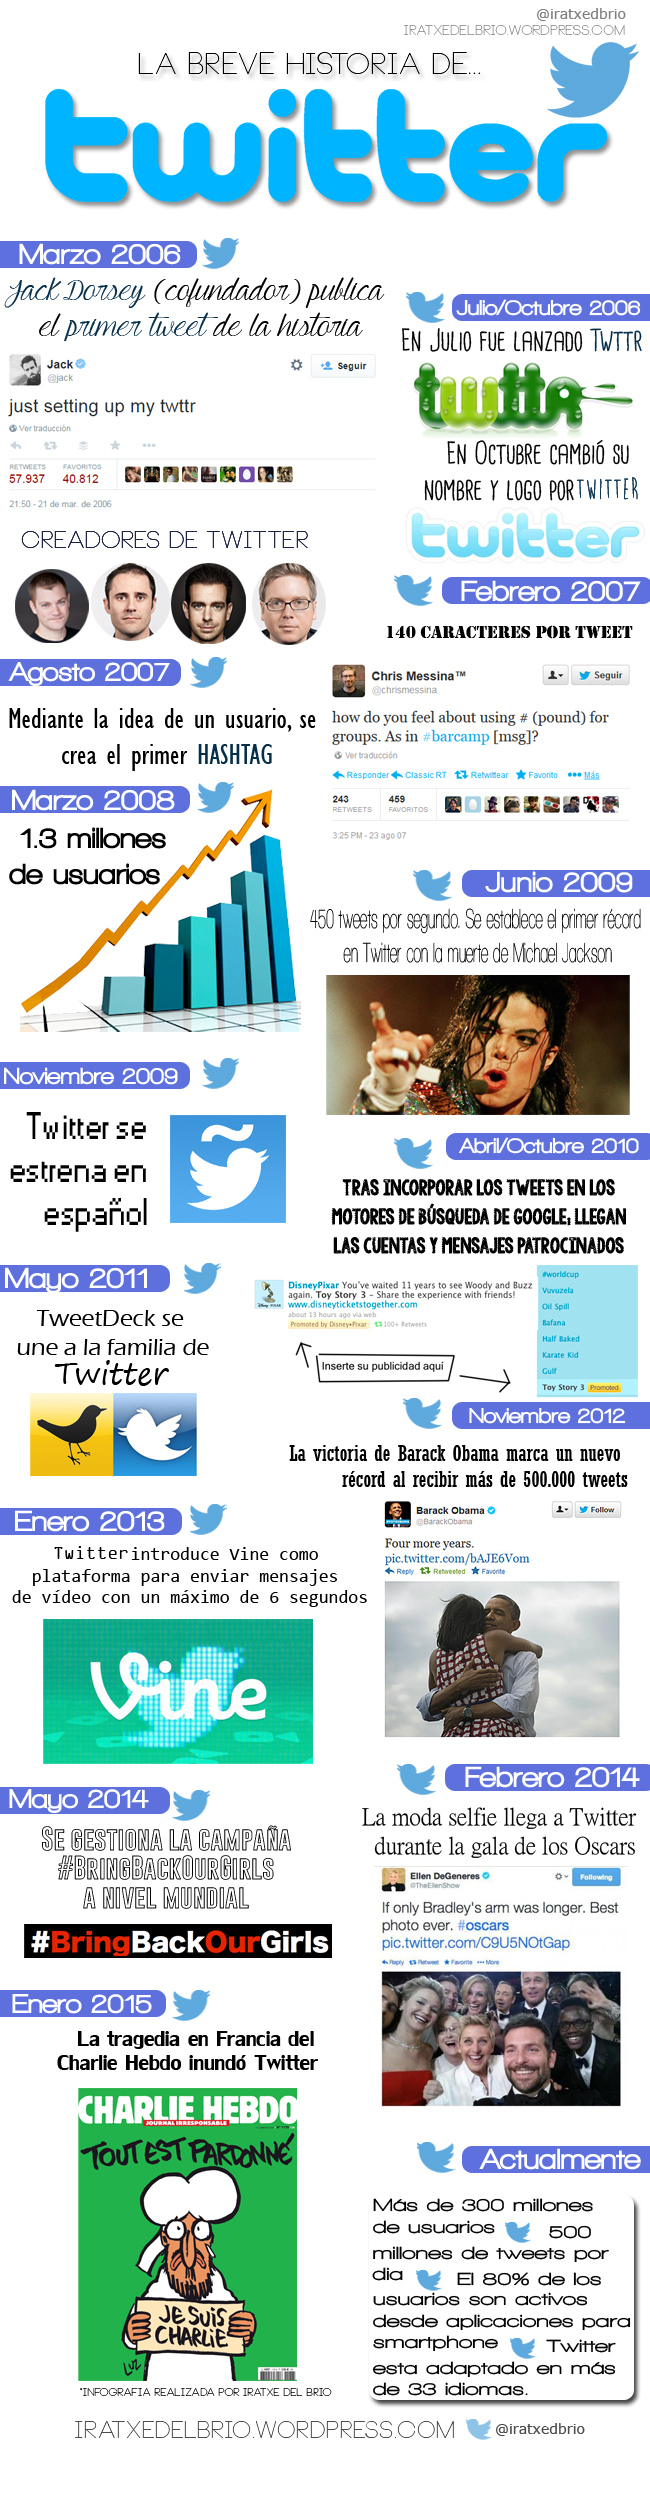 La breve Historia de Twitter